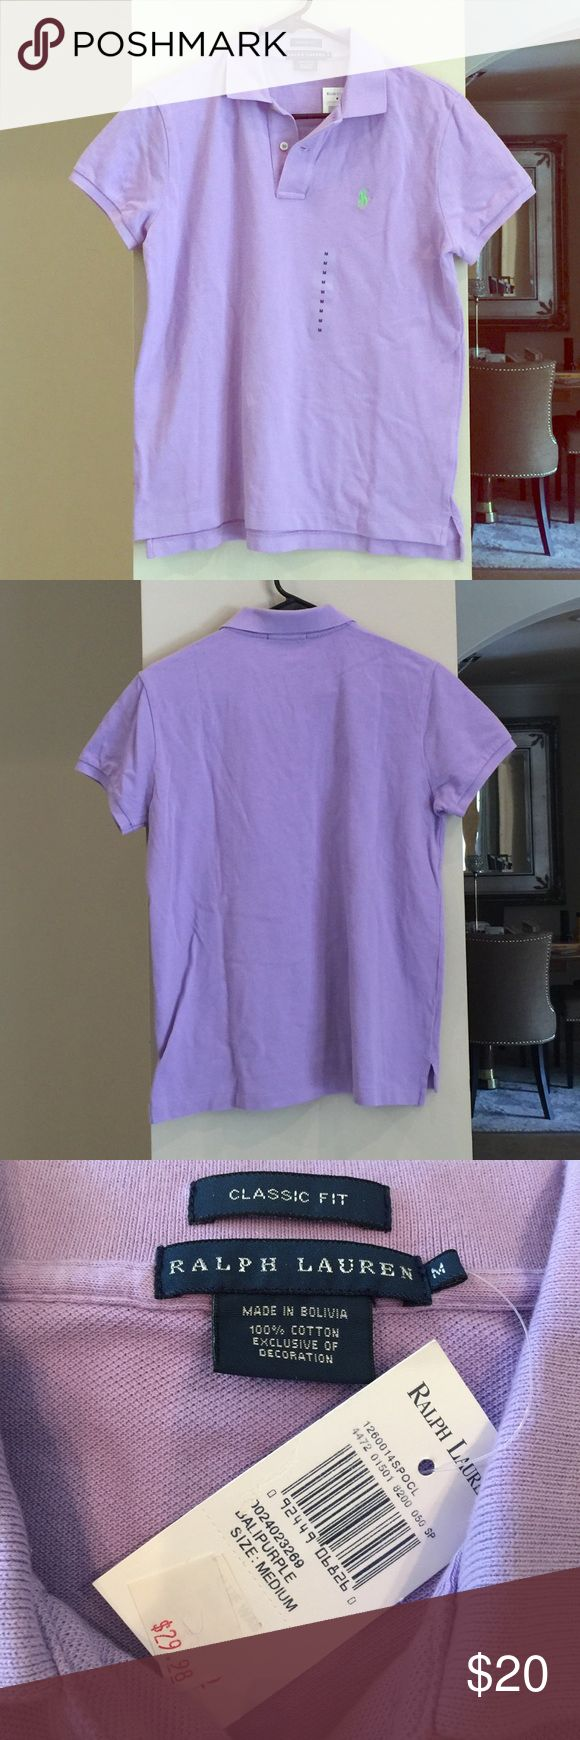 "Ralph Lauren Classic Fit polo size M Brand new Ralph Lauren Classic Fit polo! Color ""Bali Purple"" and 100% cotton. Ralph Lauren Tops Button Down Shirts"